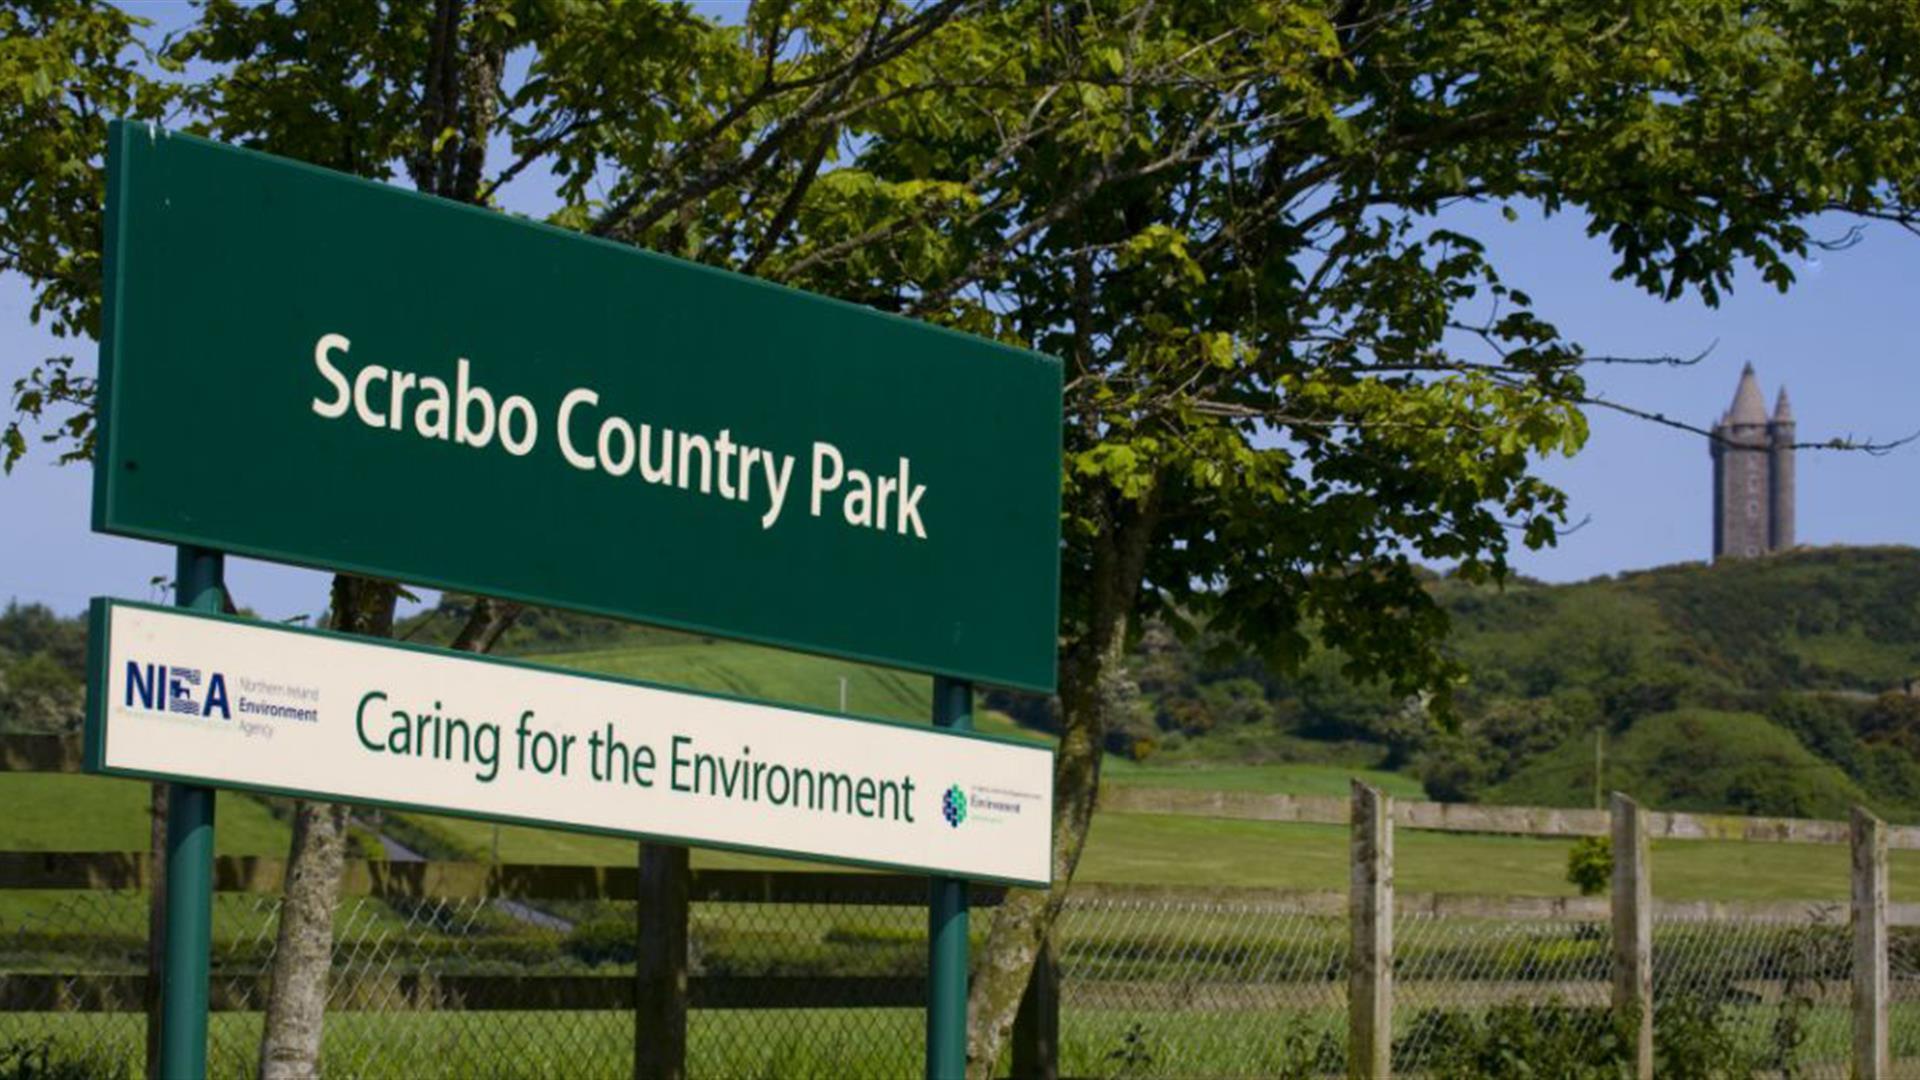 Scrabo Country Park